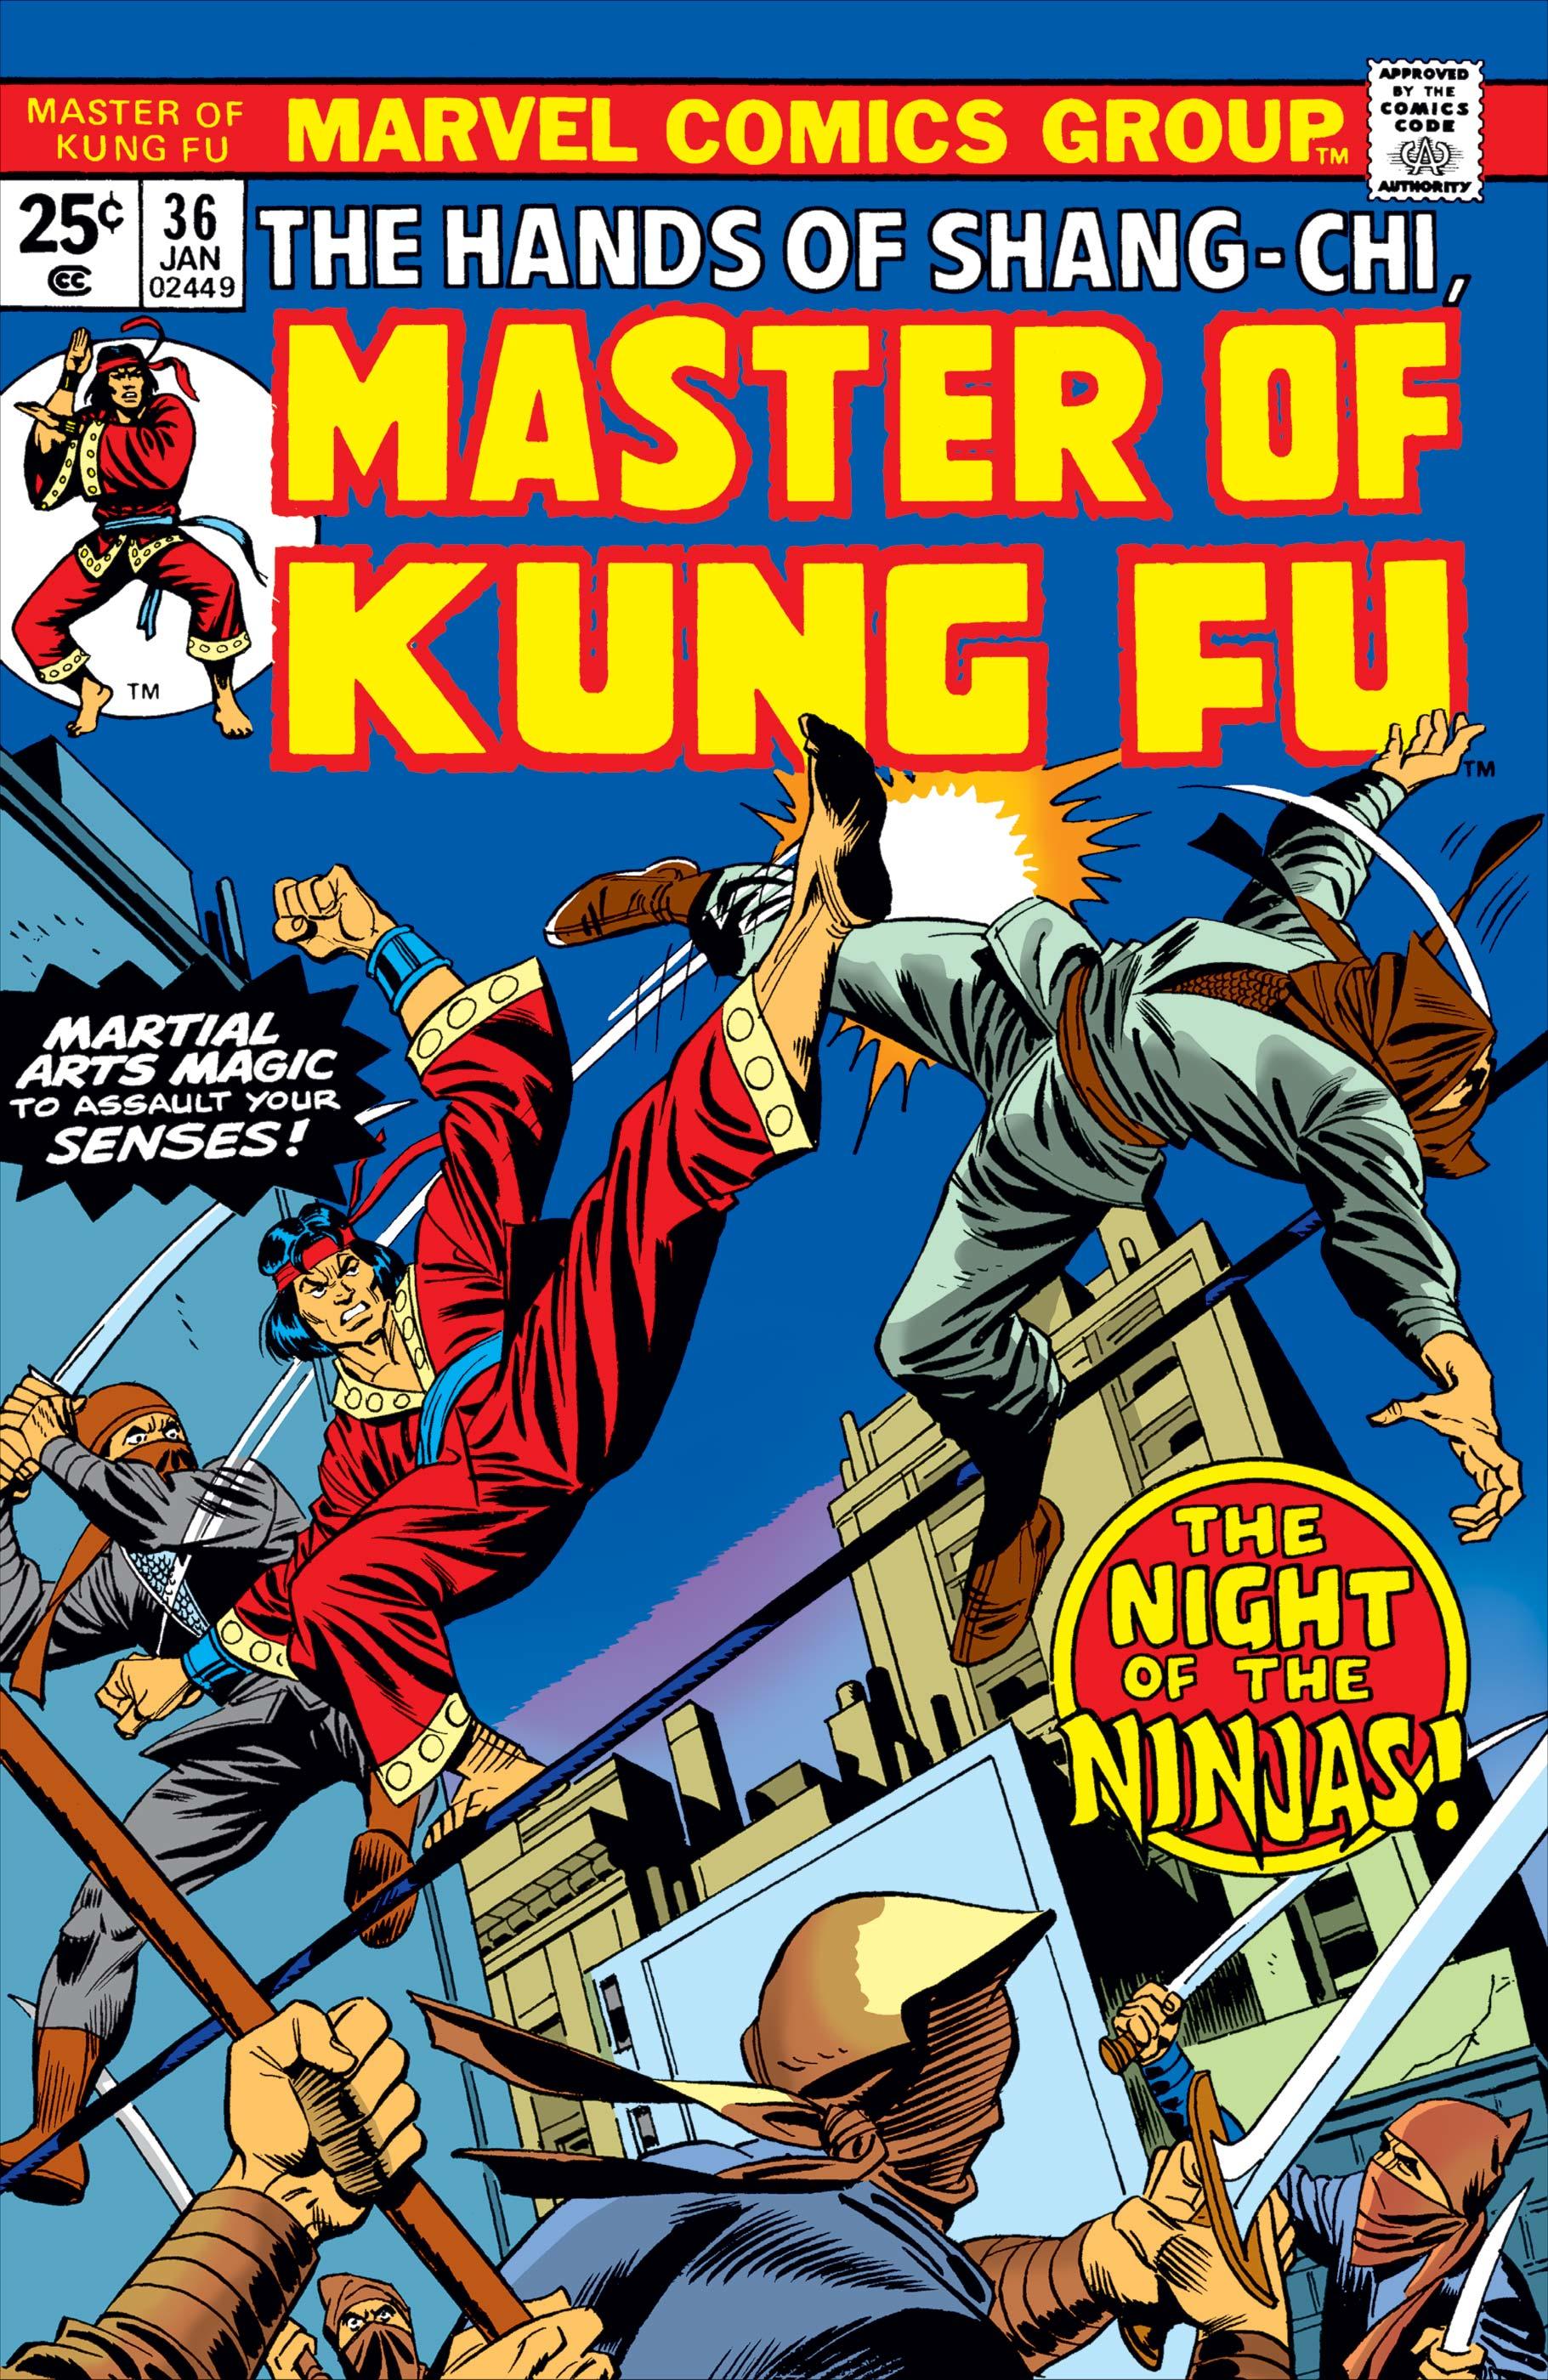 Master of Kung Fu (1974) #36